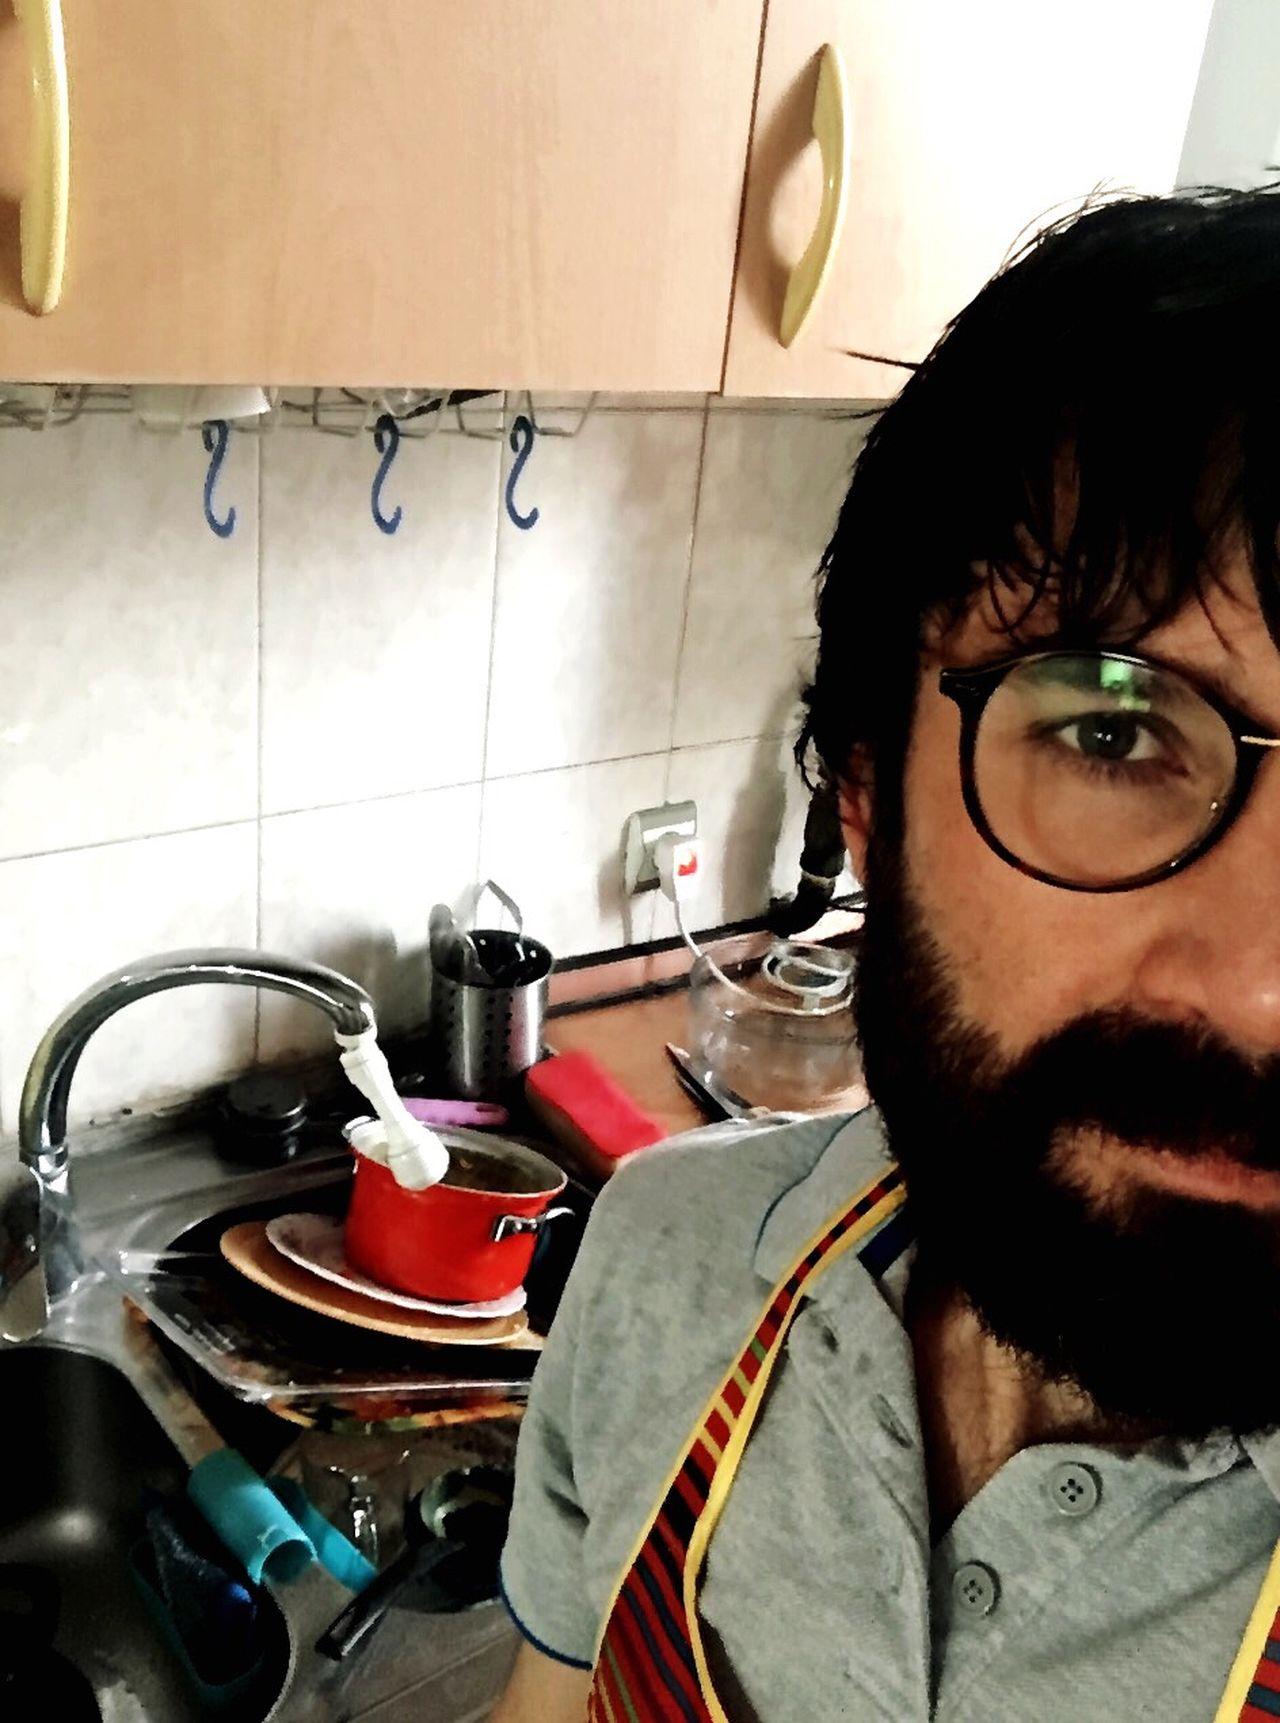 Iran Iran♥ Iranian Persian Tehran Tehran, Iran Tahran Man Kitchen Mutfak Bulaşık Dishwashing First Eyeem Photo OpenEdit Open Edit EyeEm Best Shots EyeEm Nature Lover EyeEm Gallery EyeEm Best Edits EyeEm EyeEmBestPics Eyeemphotography Taking Photos Taking Pictures Take Photos